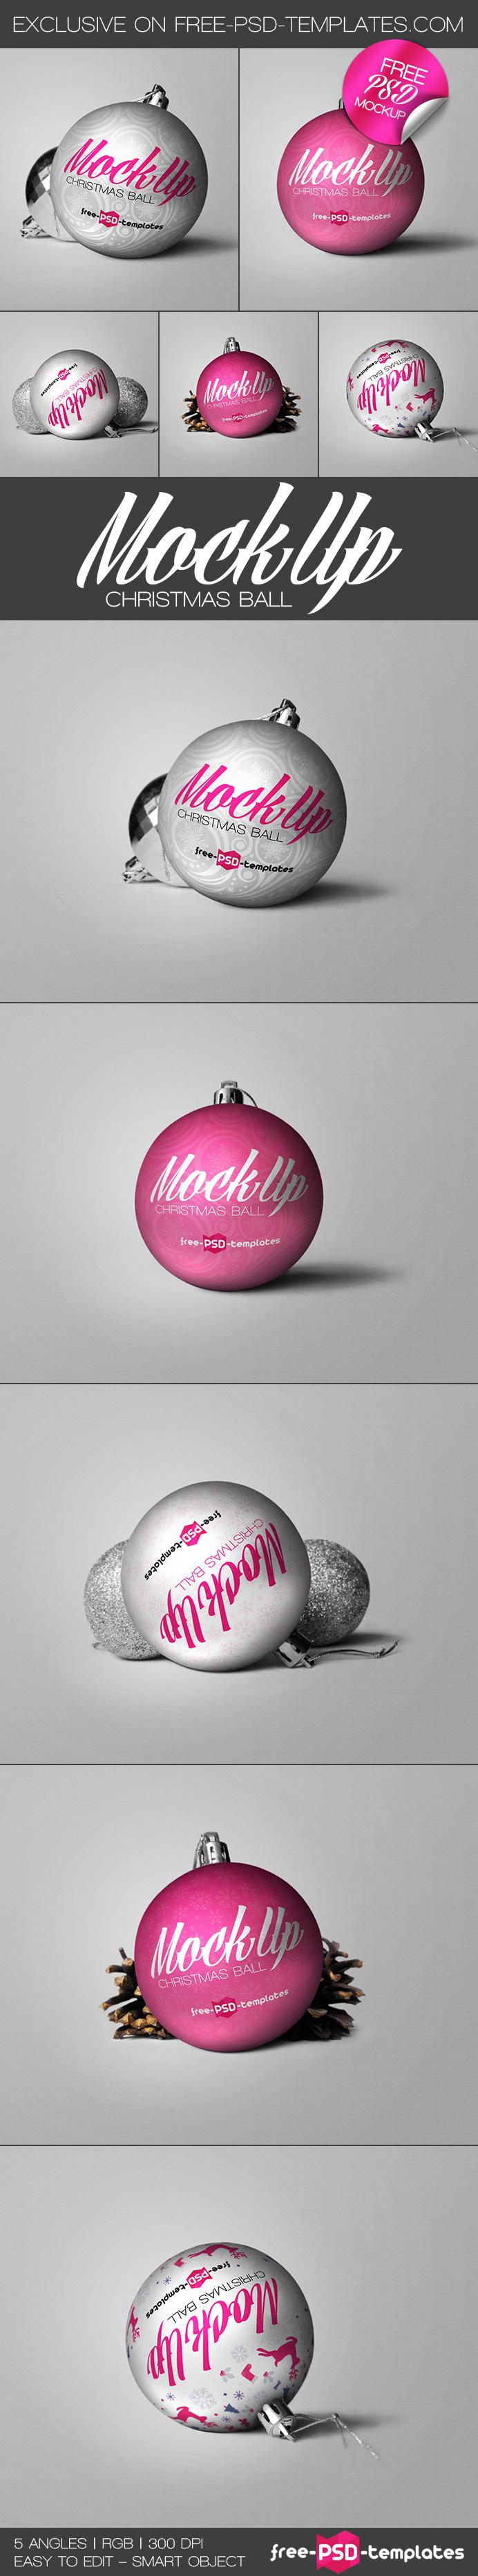 Free christmas ball mock up free psd templates